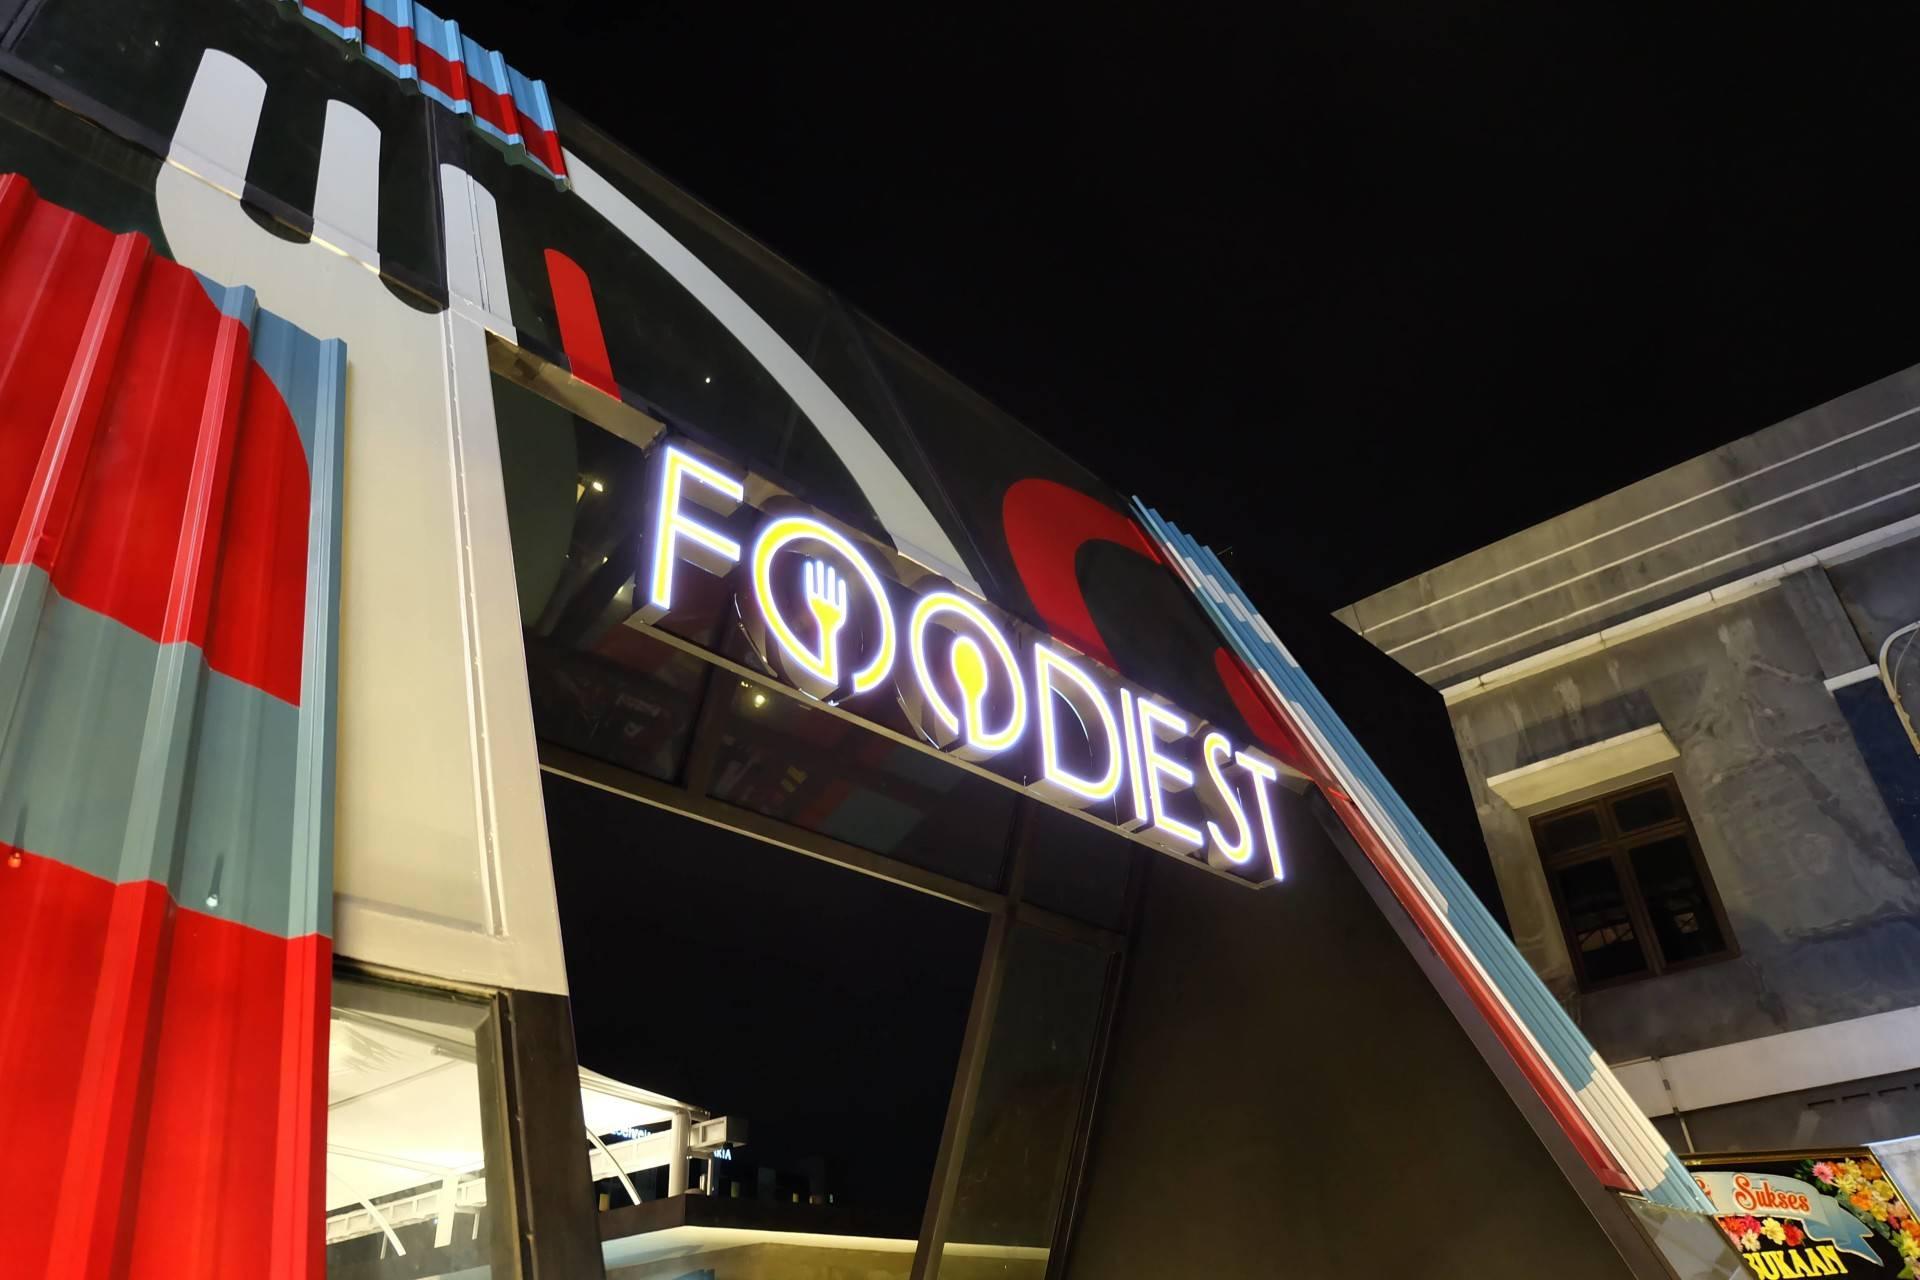 Meandpartners Foodiest Yogyakarta, Kota Yogyakarta, Daerah Istimewa Yogyakarta, Indonesia Yogyakarta Entrance Facade Modern  2745